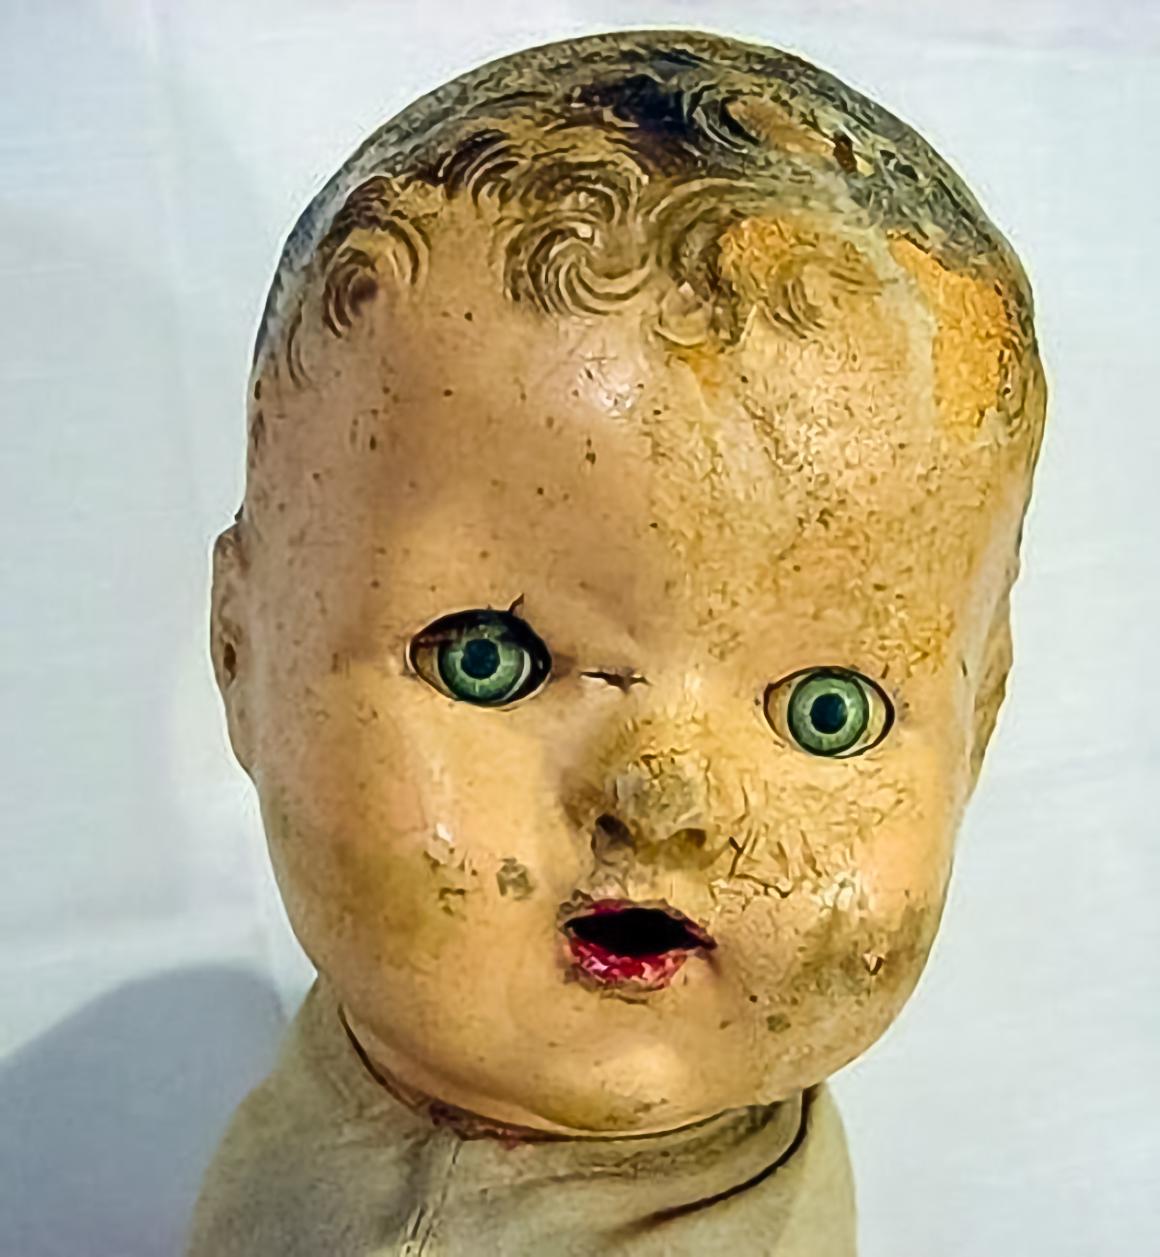 Creepy Dolls with Creepy Doll Eyes